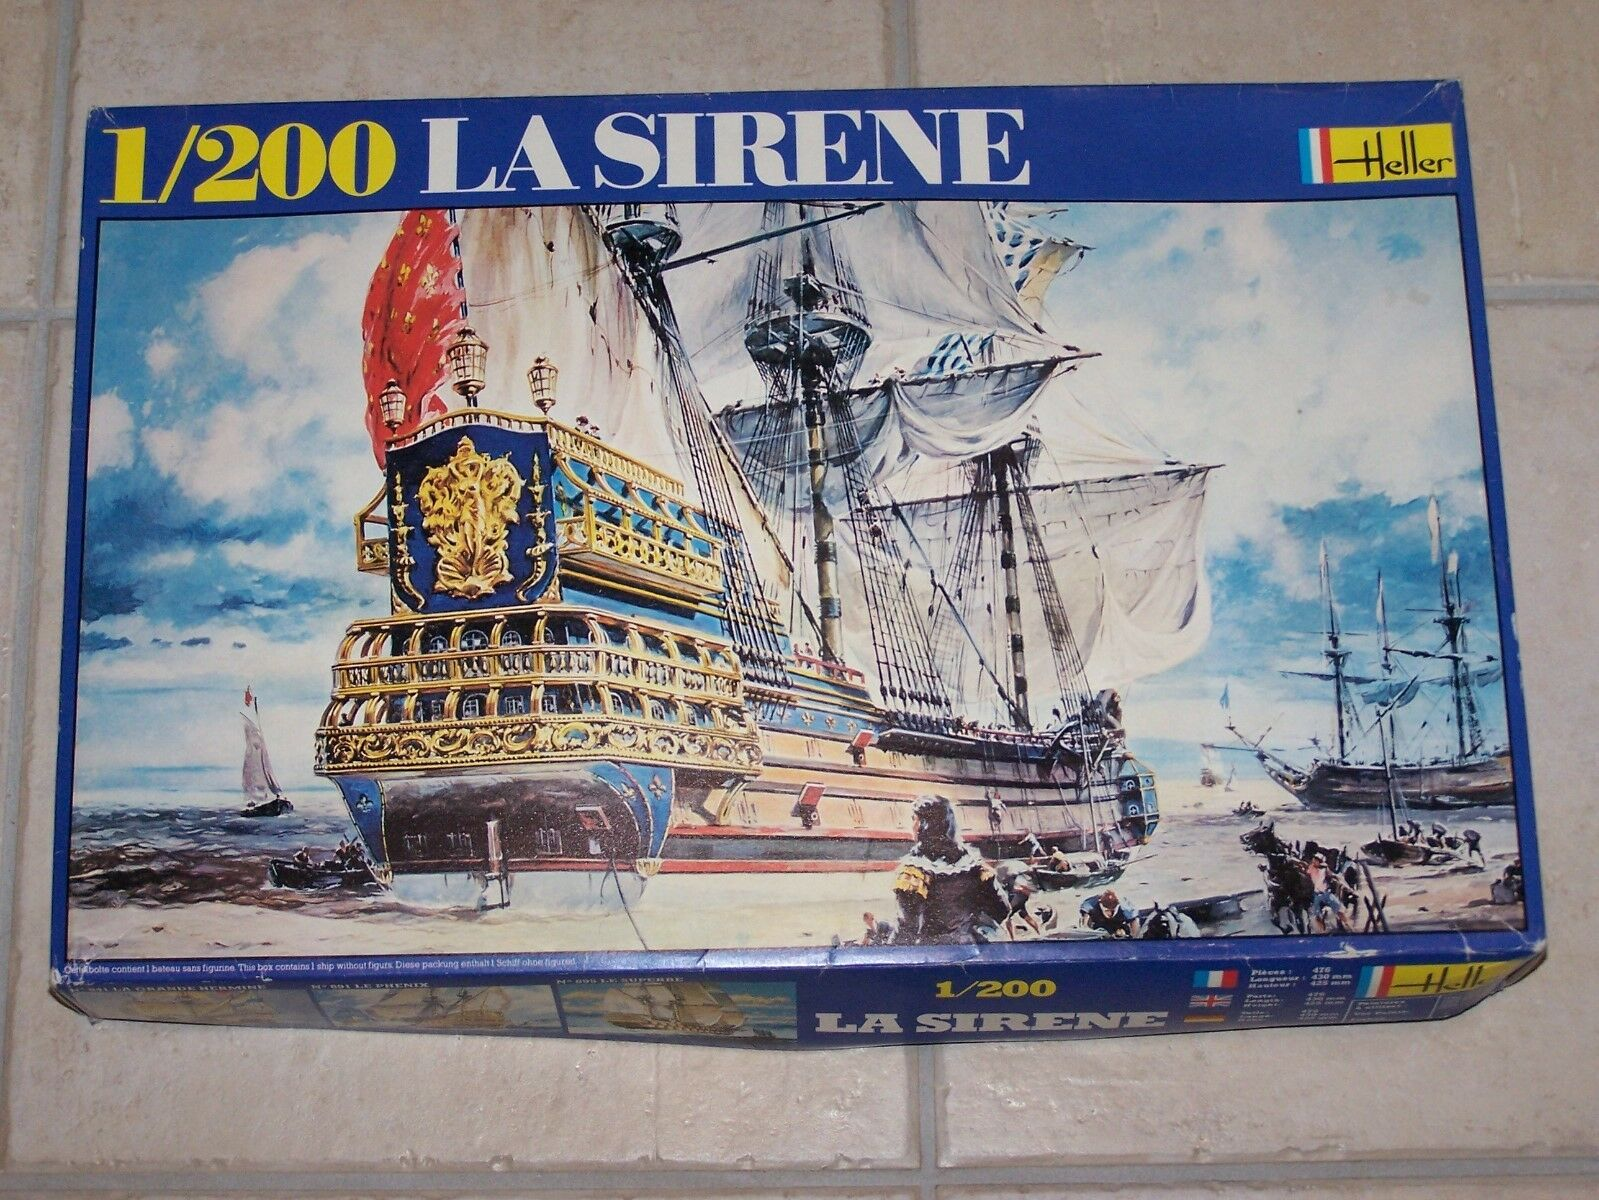 Maquette HELLER  1/200ème LA SIRENE